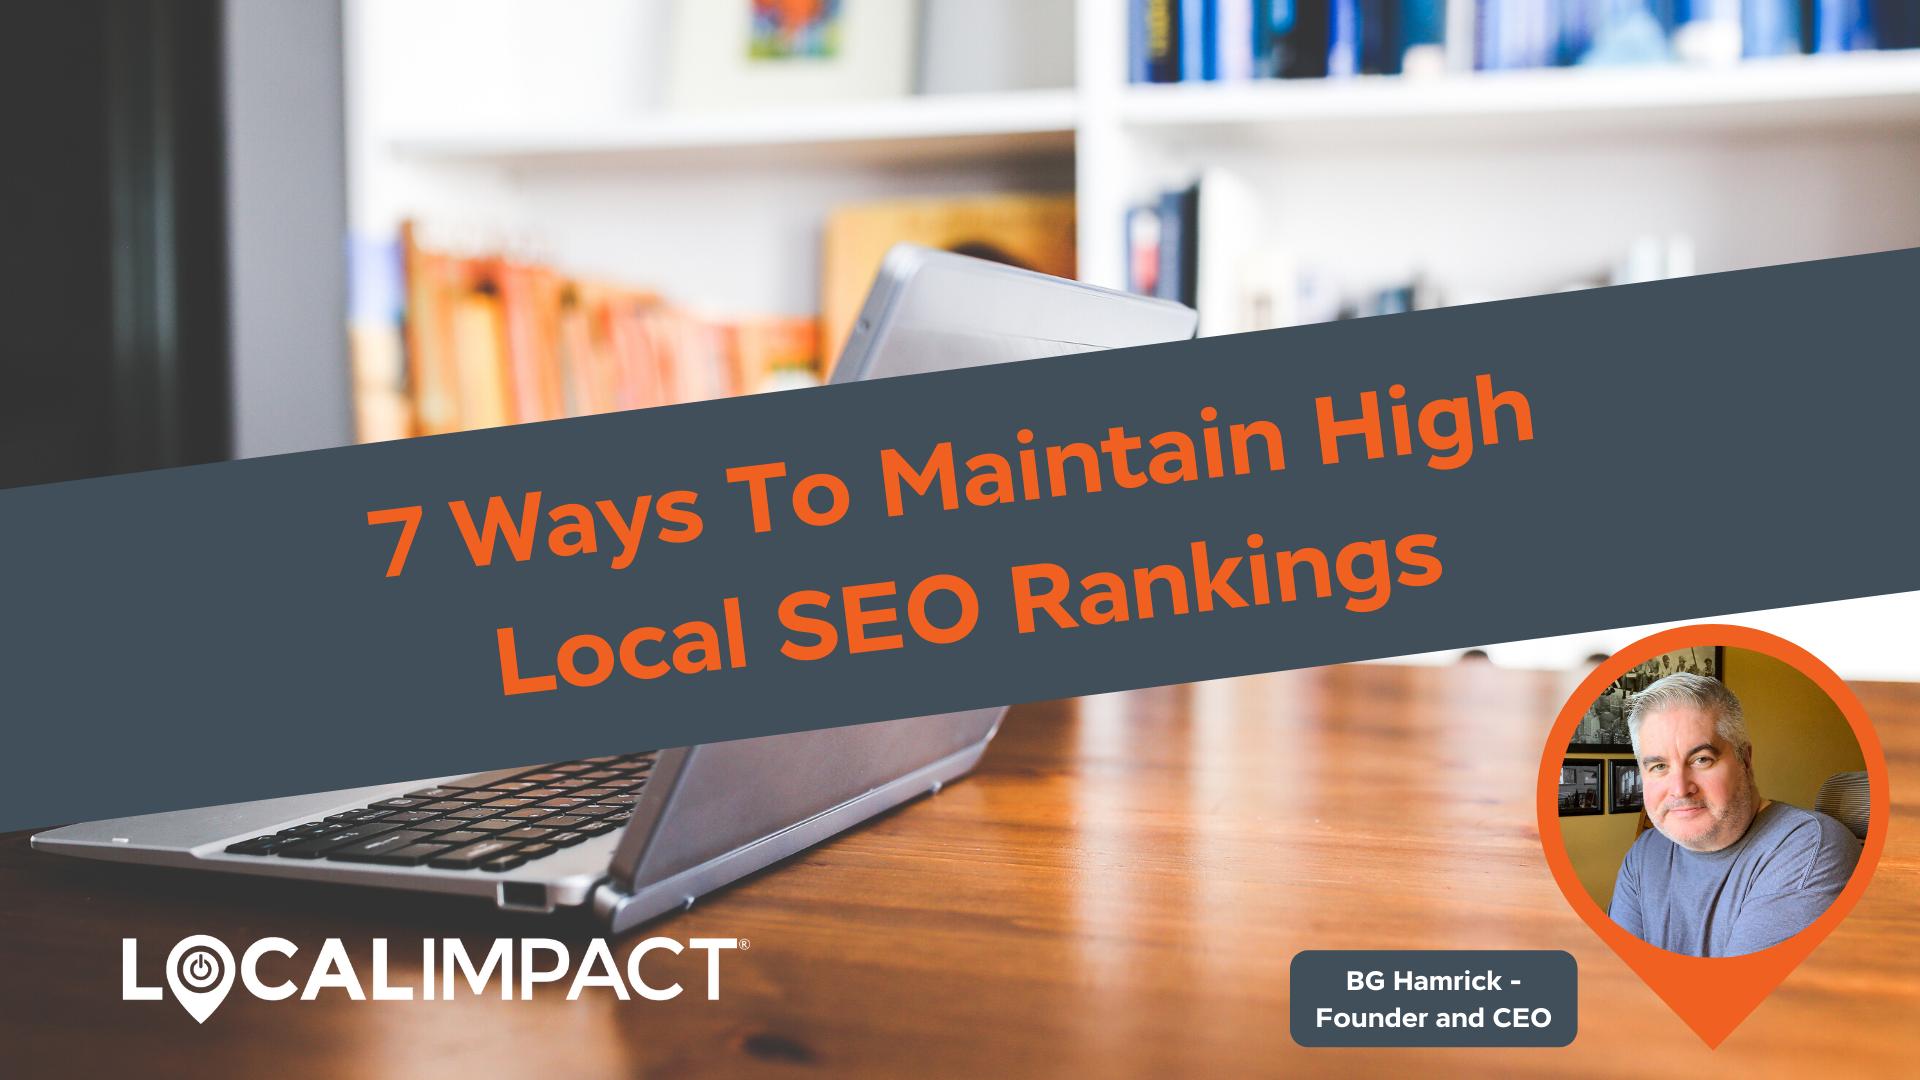 7 Ways to Maintain High Local SEO Rankings - Local Impact Blog